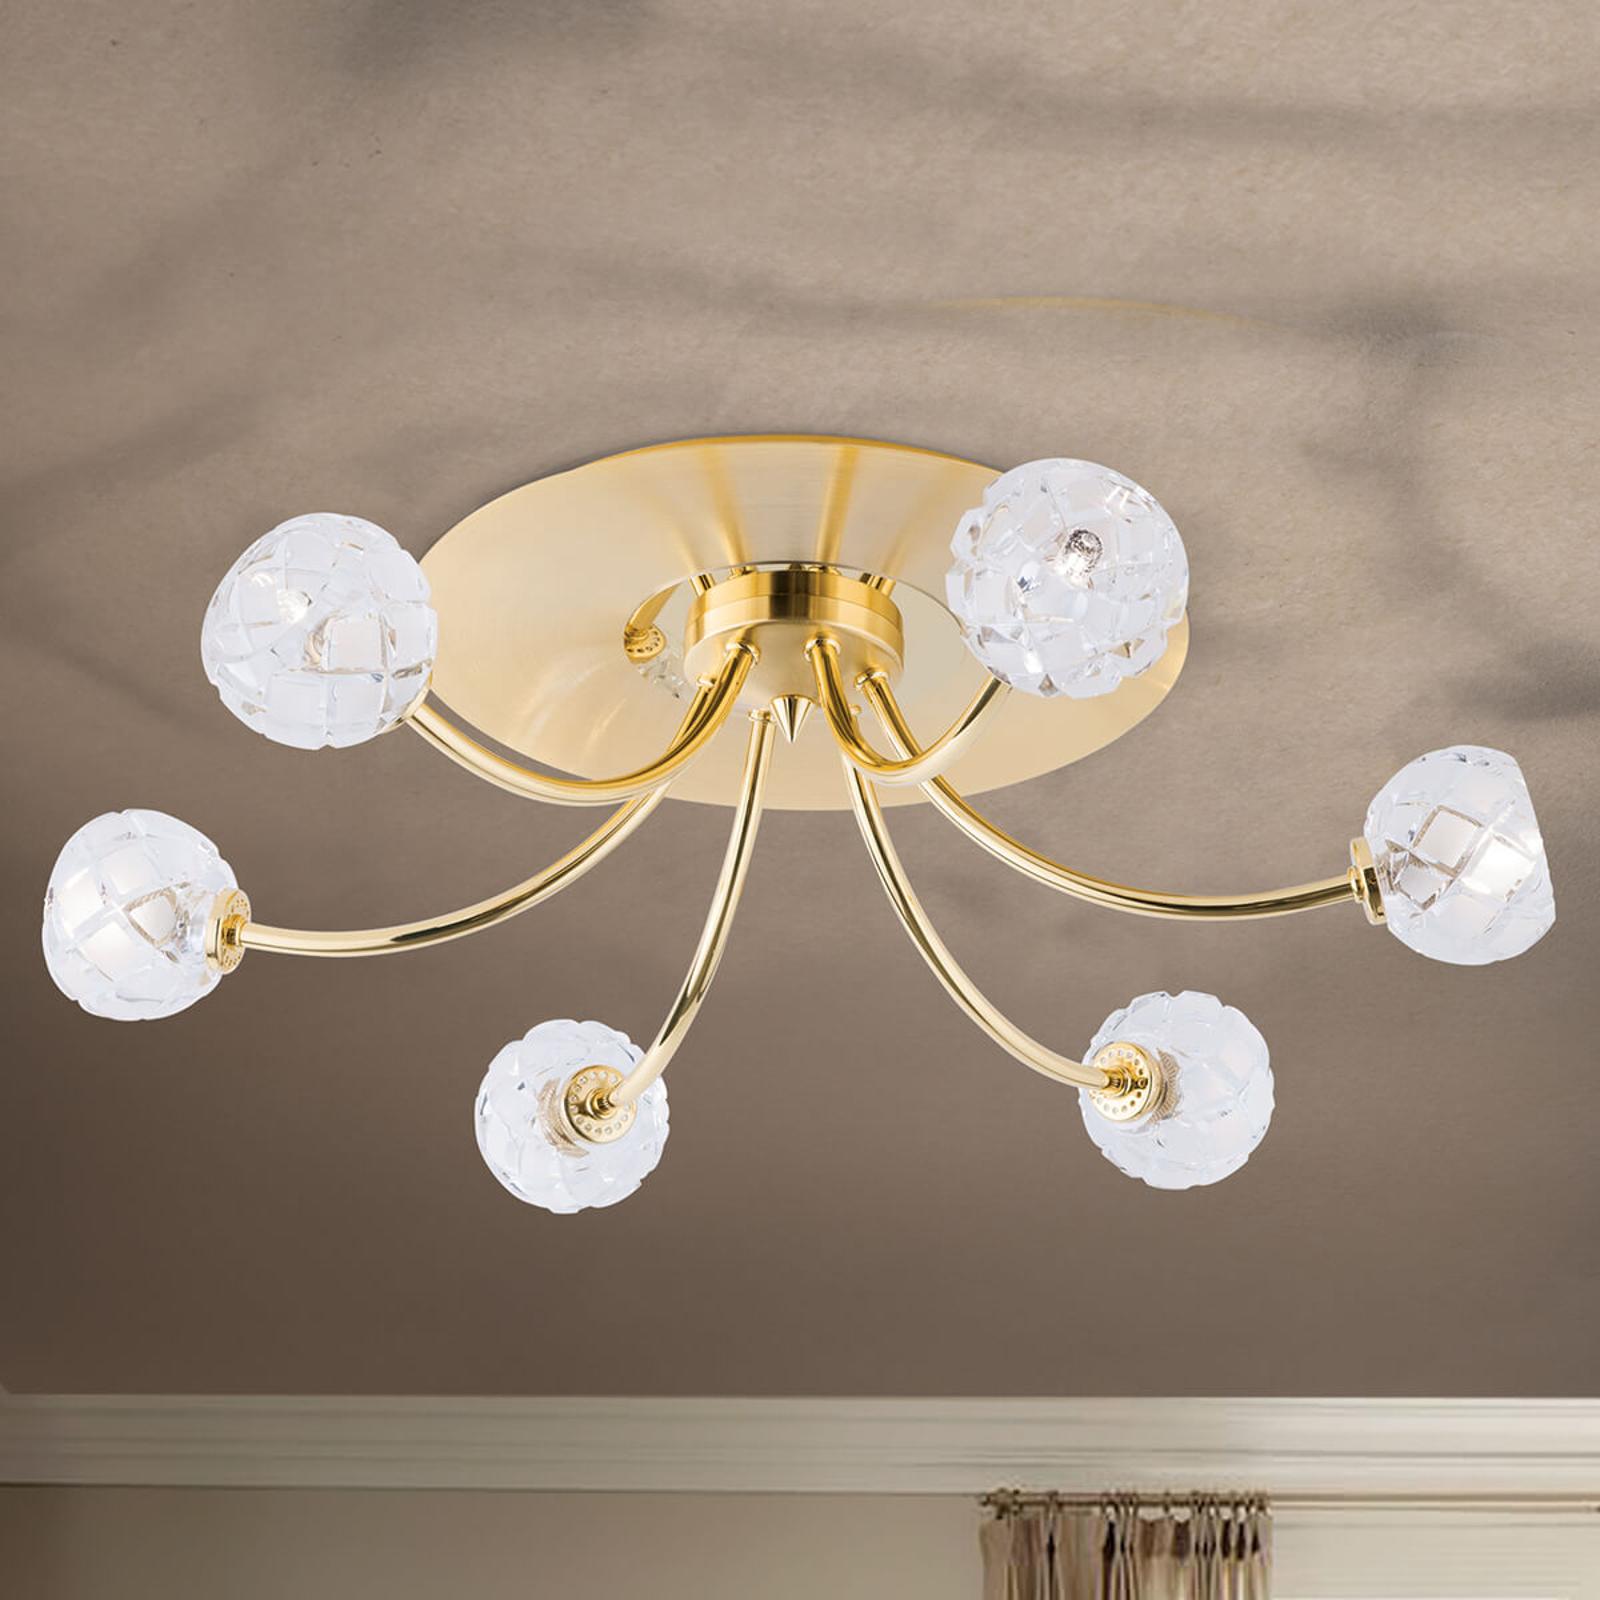 Loodkristal-plafondlamp Maderno, goud, 57cm